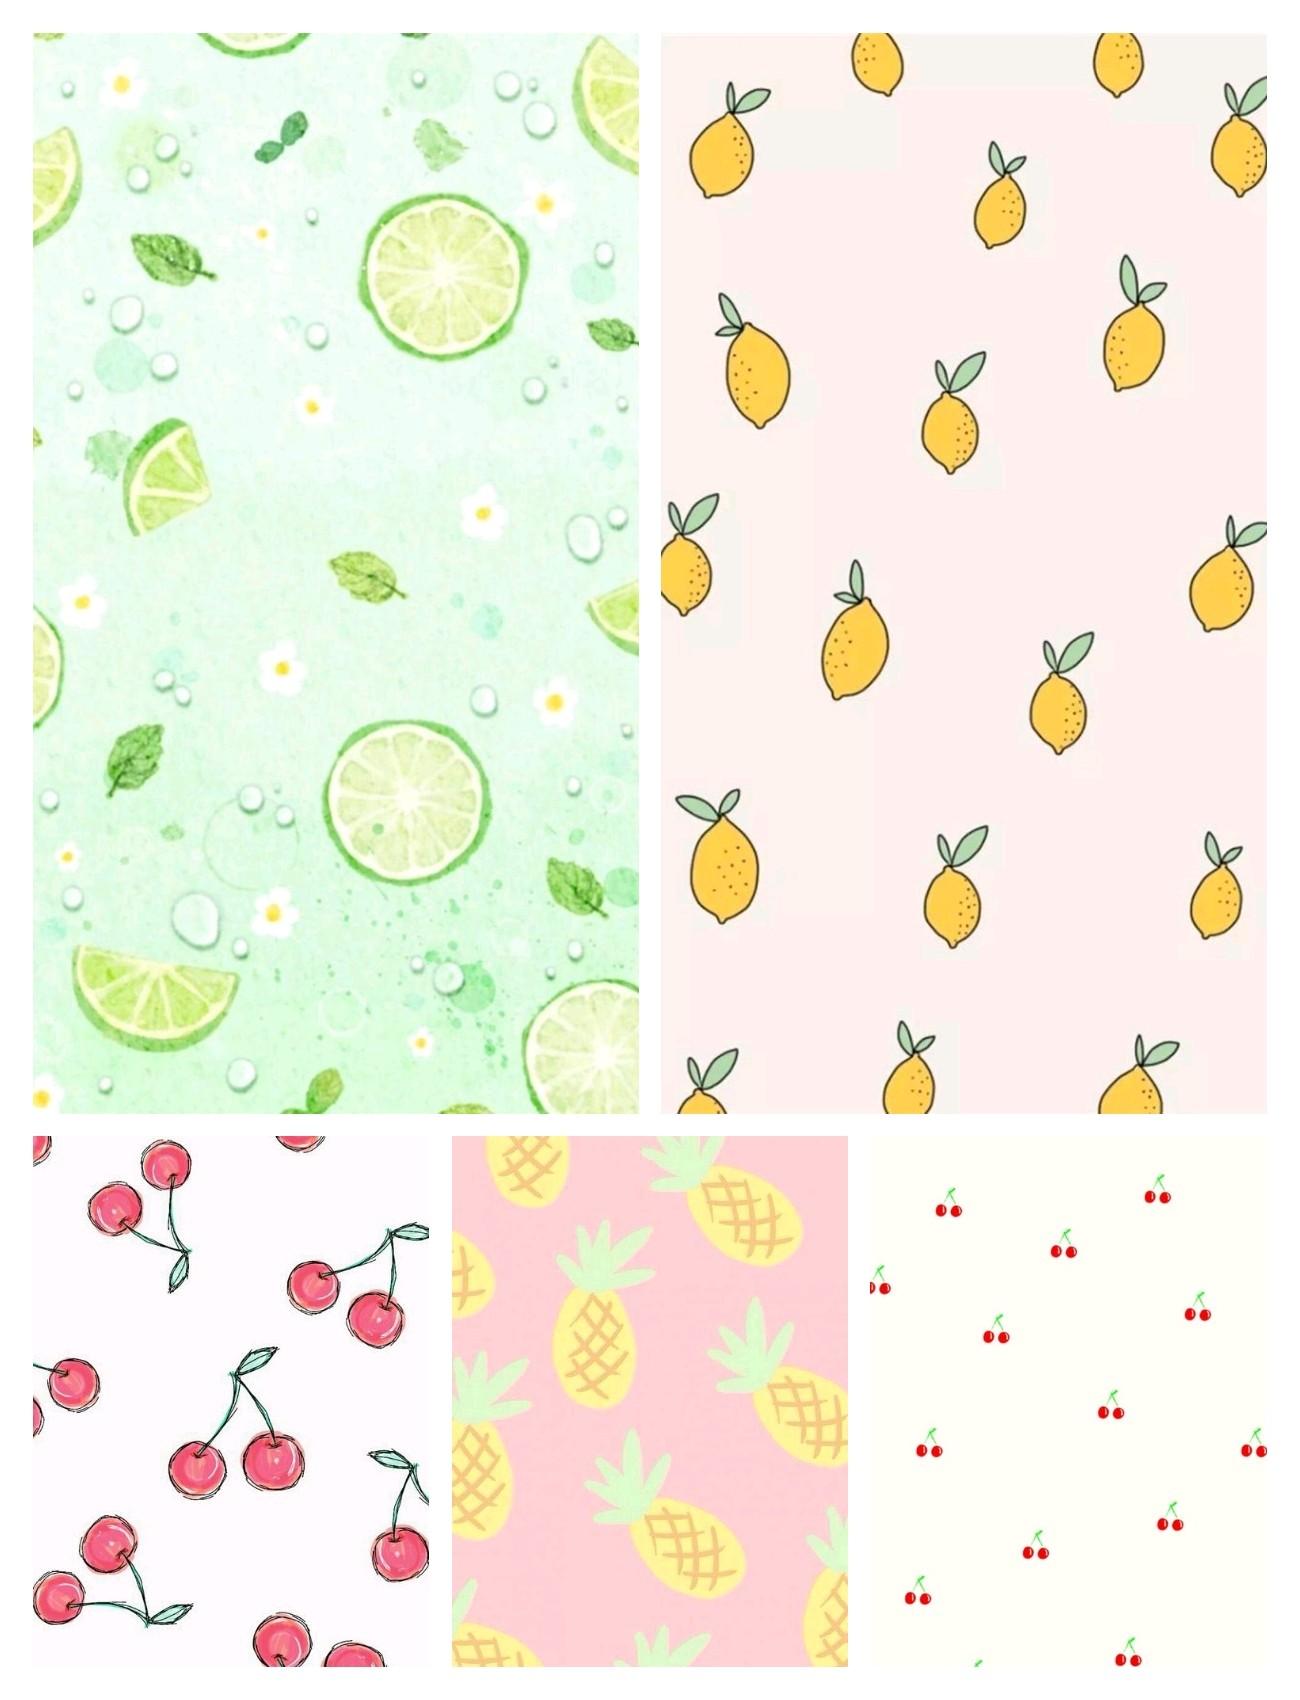 《v粉主题素材》水果平铺壁纸